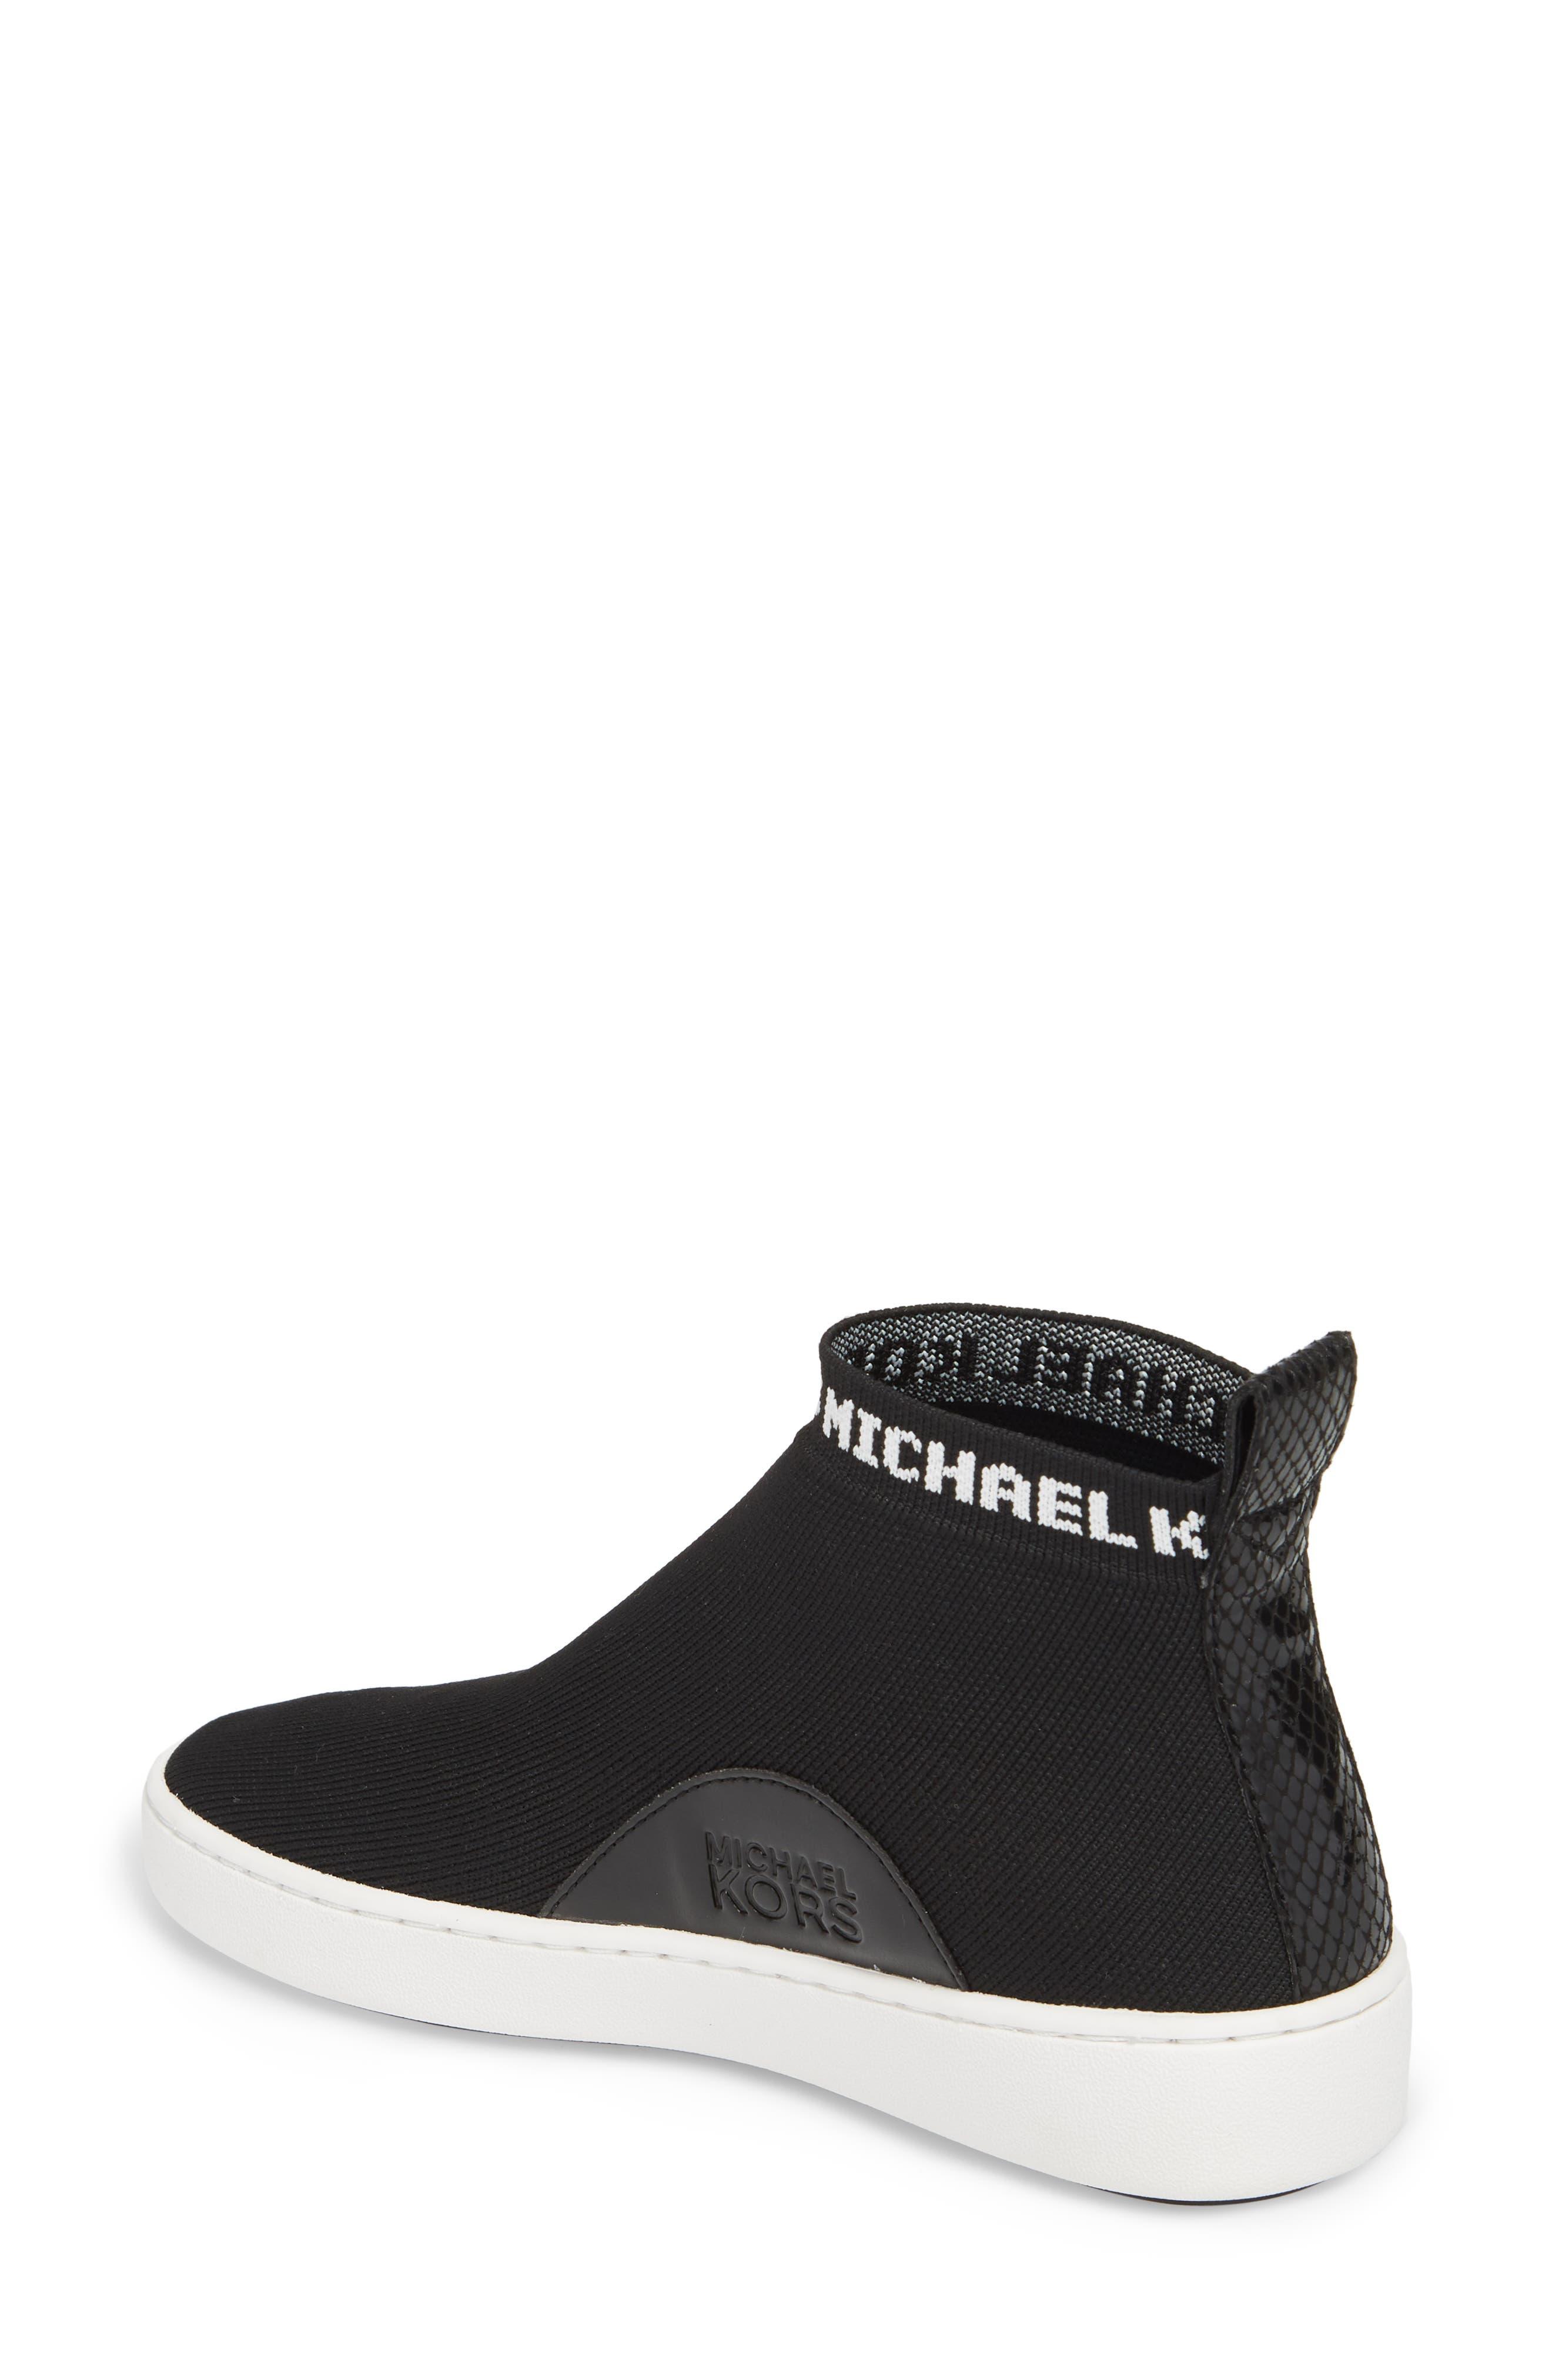 Hilda High Top Sock Sneaker,                             Alternate thumbnail 2, color,                             Black Knit Fabric